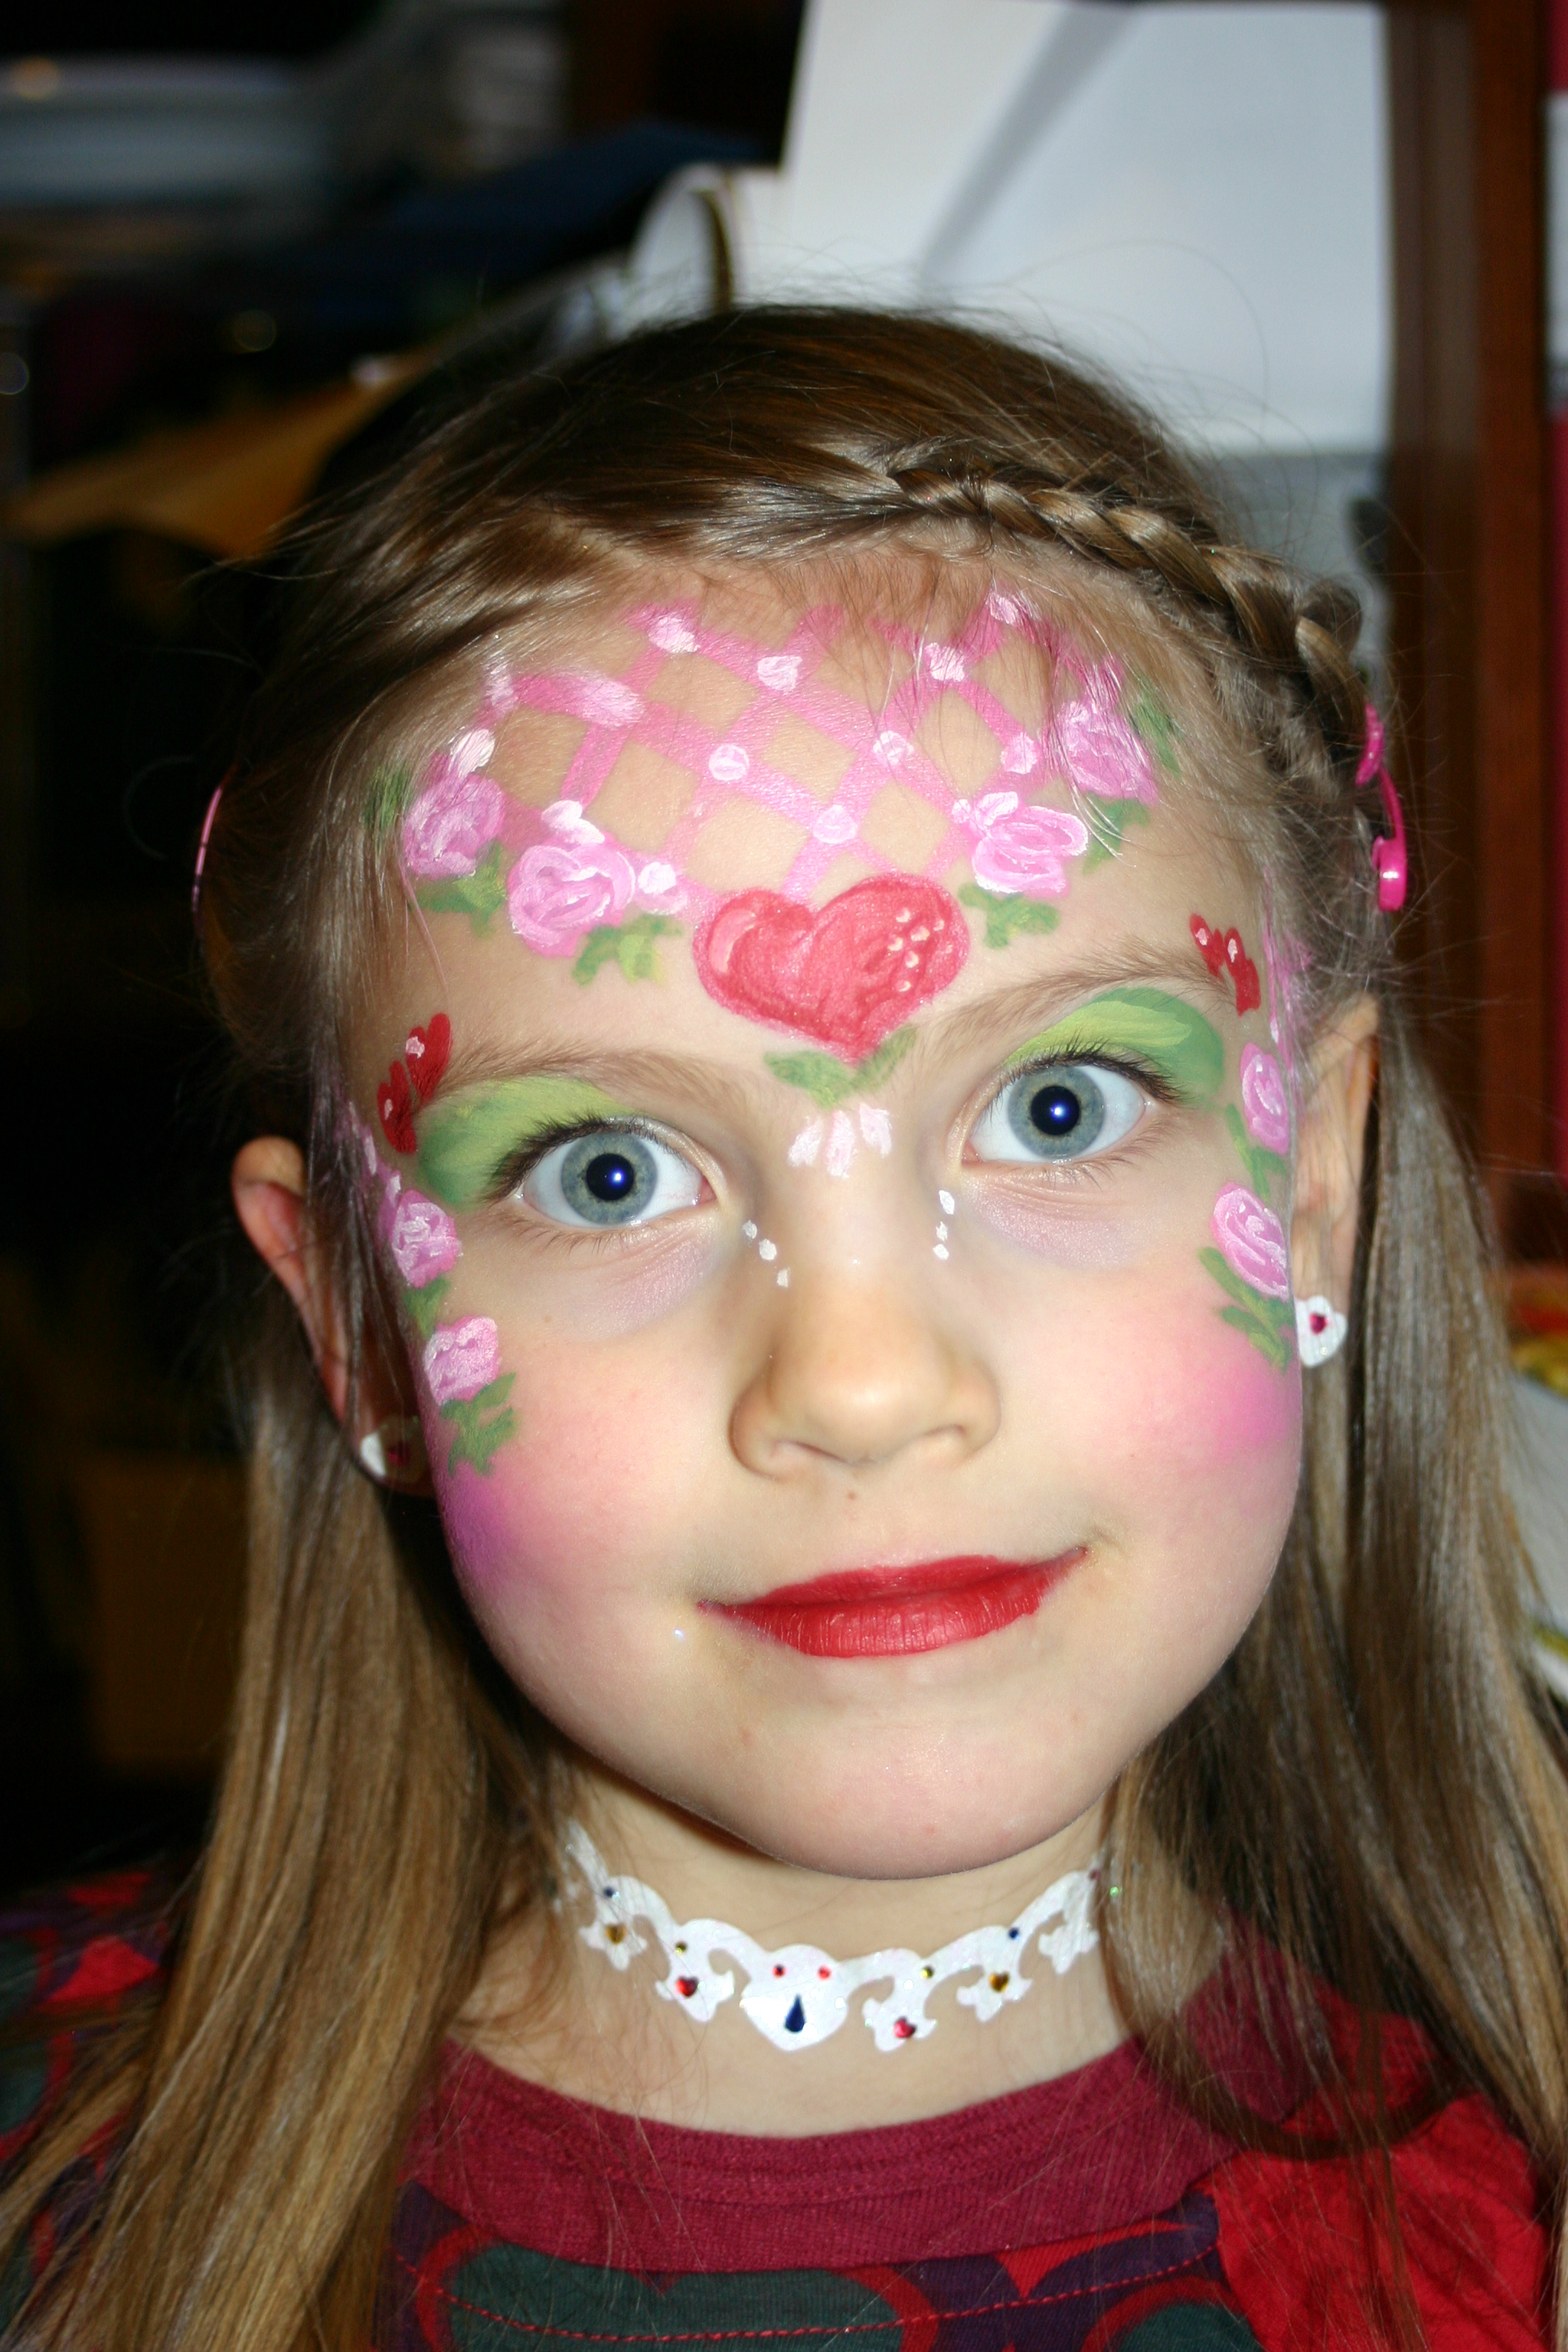 Aliette prinsessa